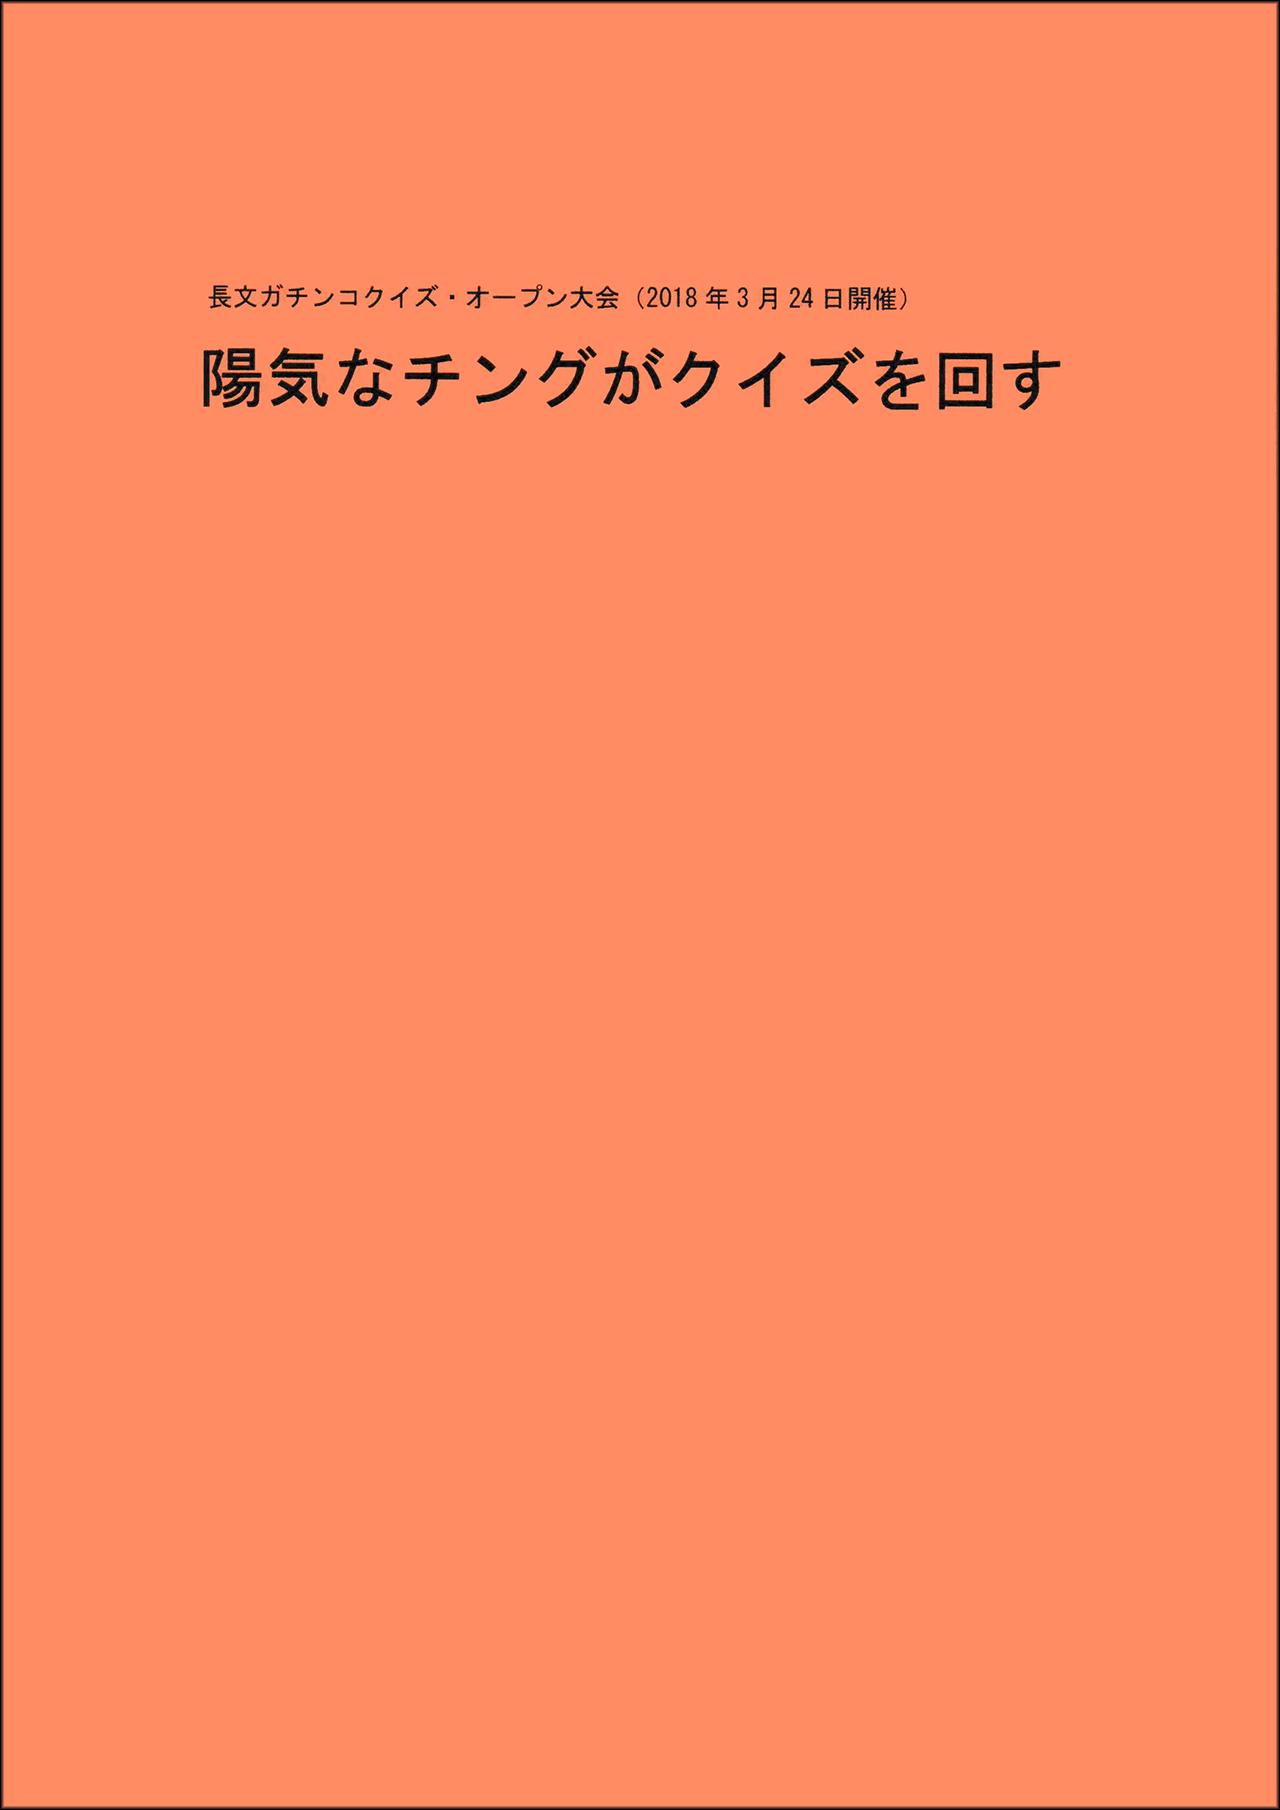 C11331432